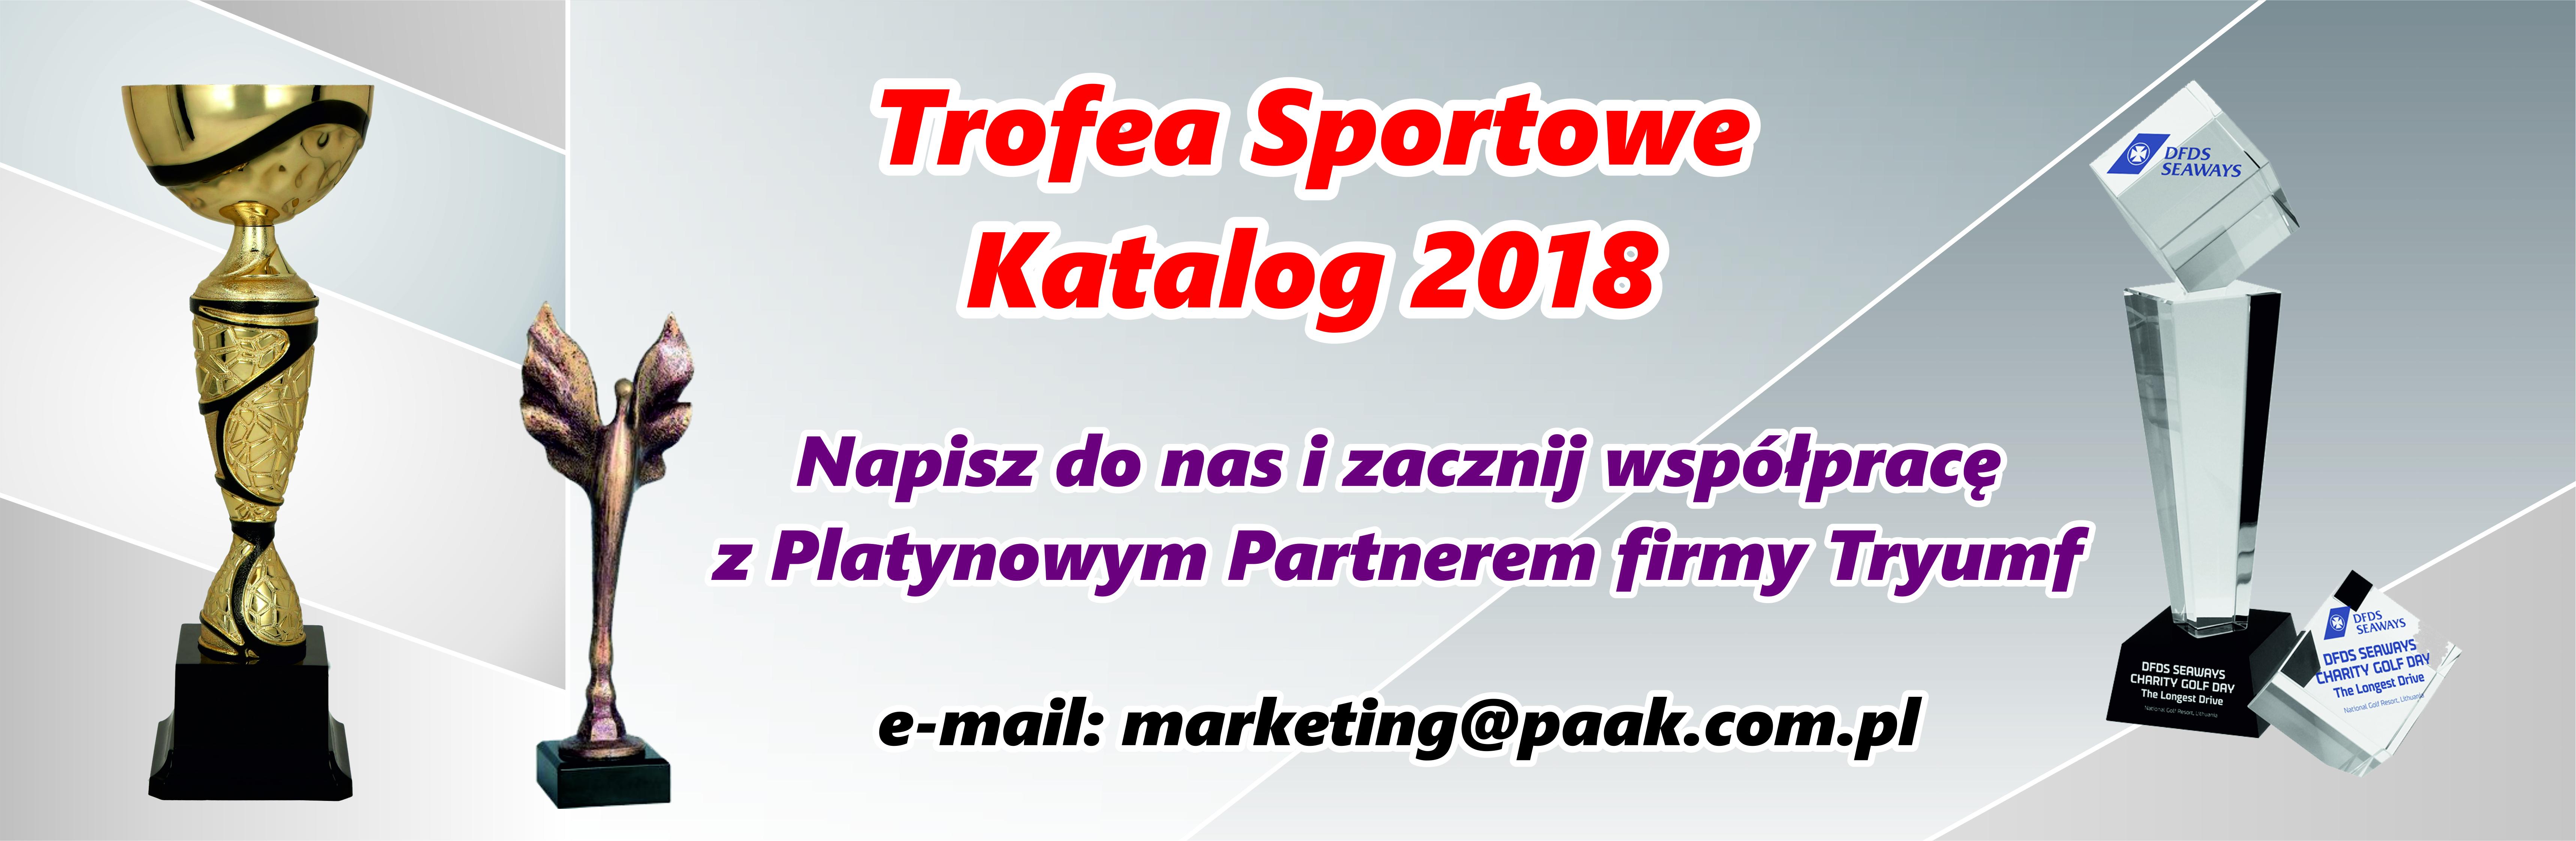 katalog_trofea_2018